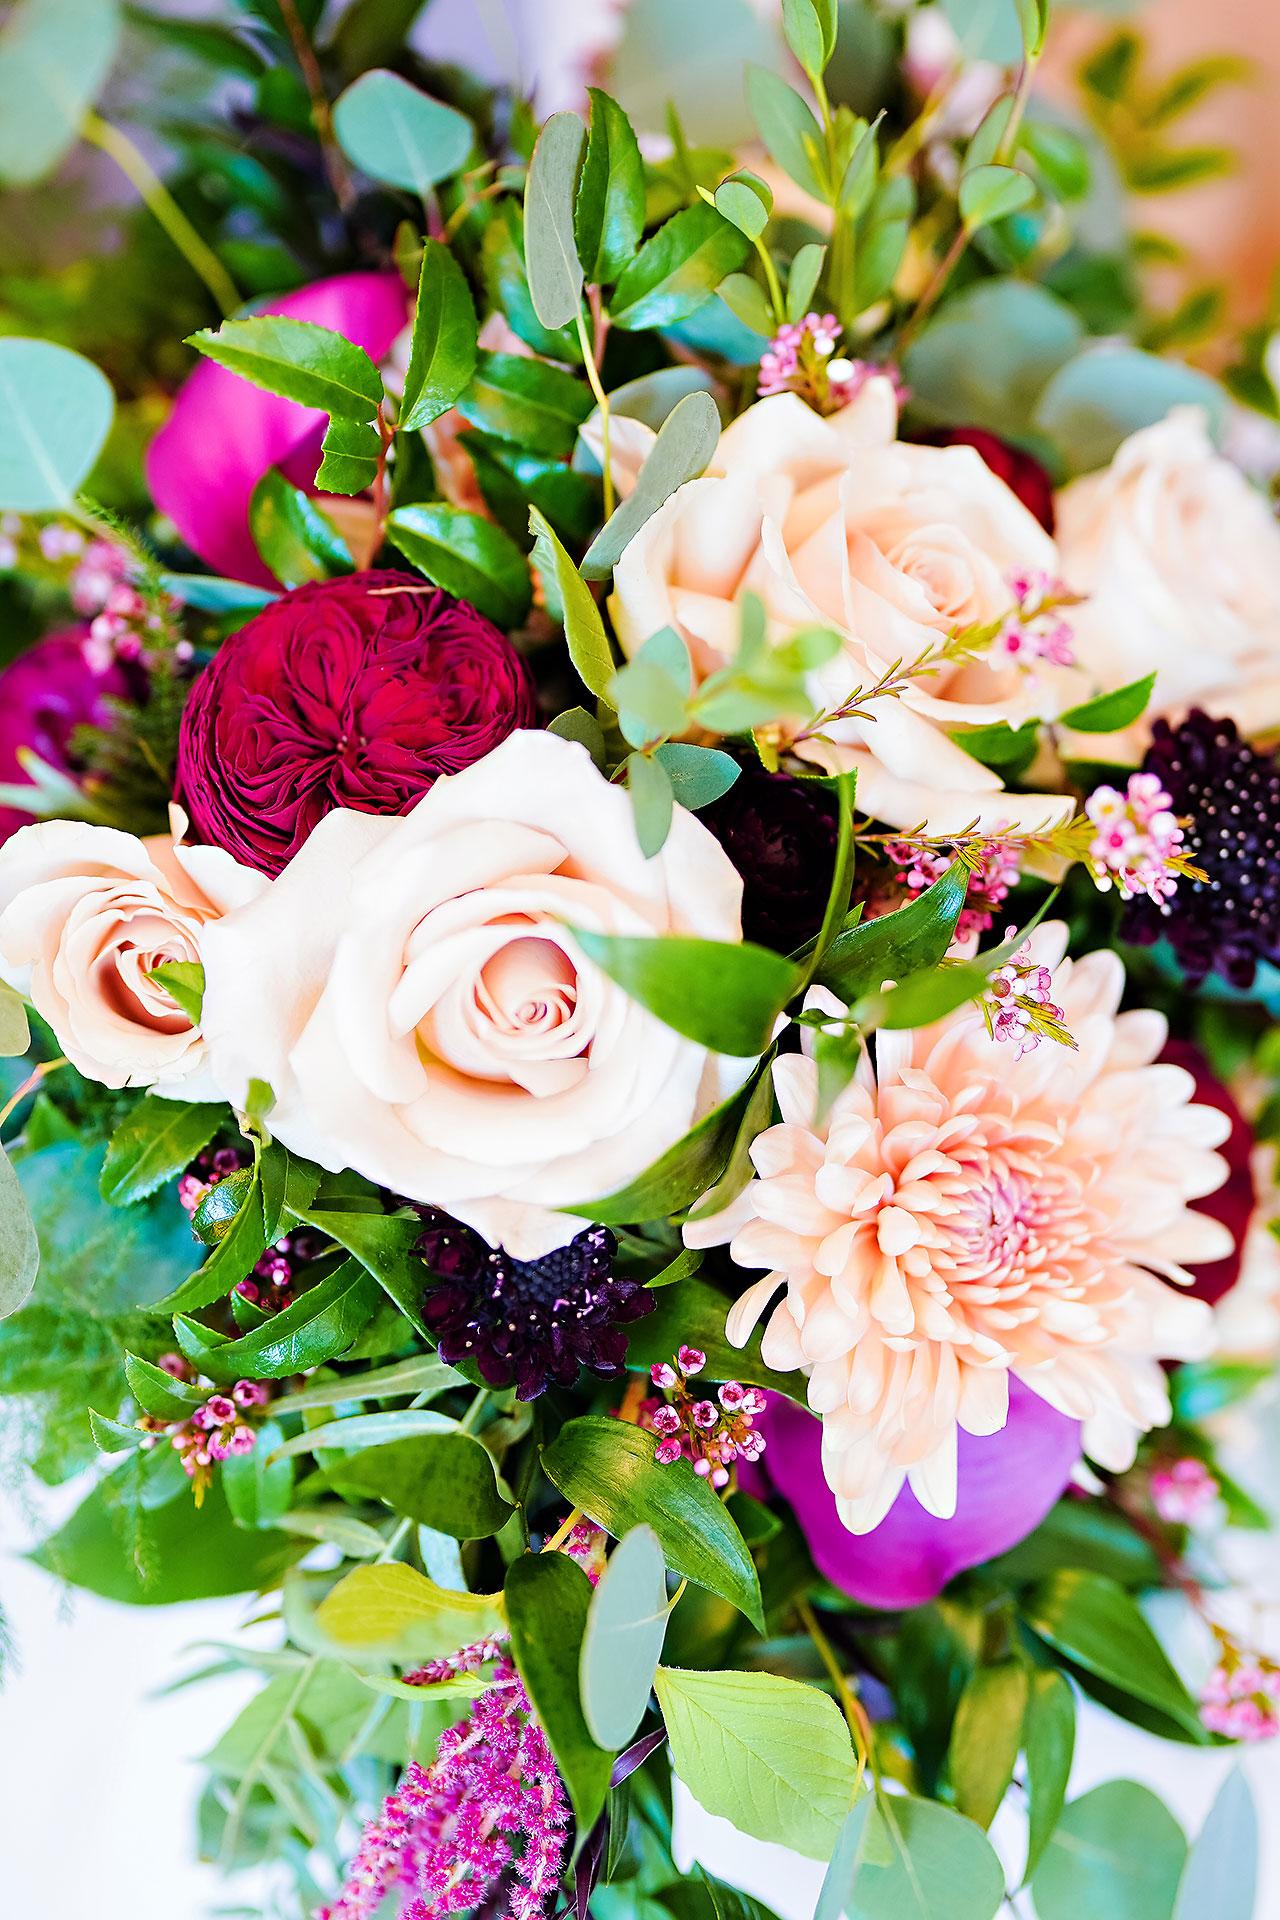 Nadia Parker Black Iris Estate Carmel Indiana Wedding May 2021 041